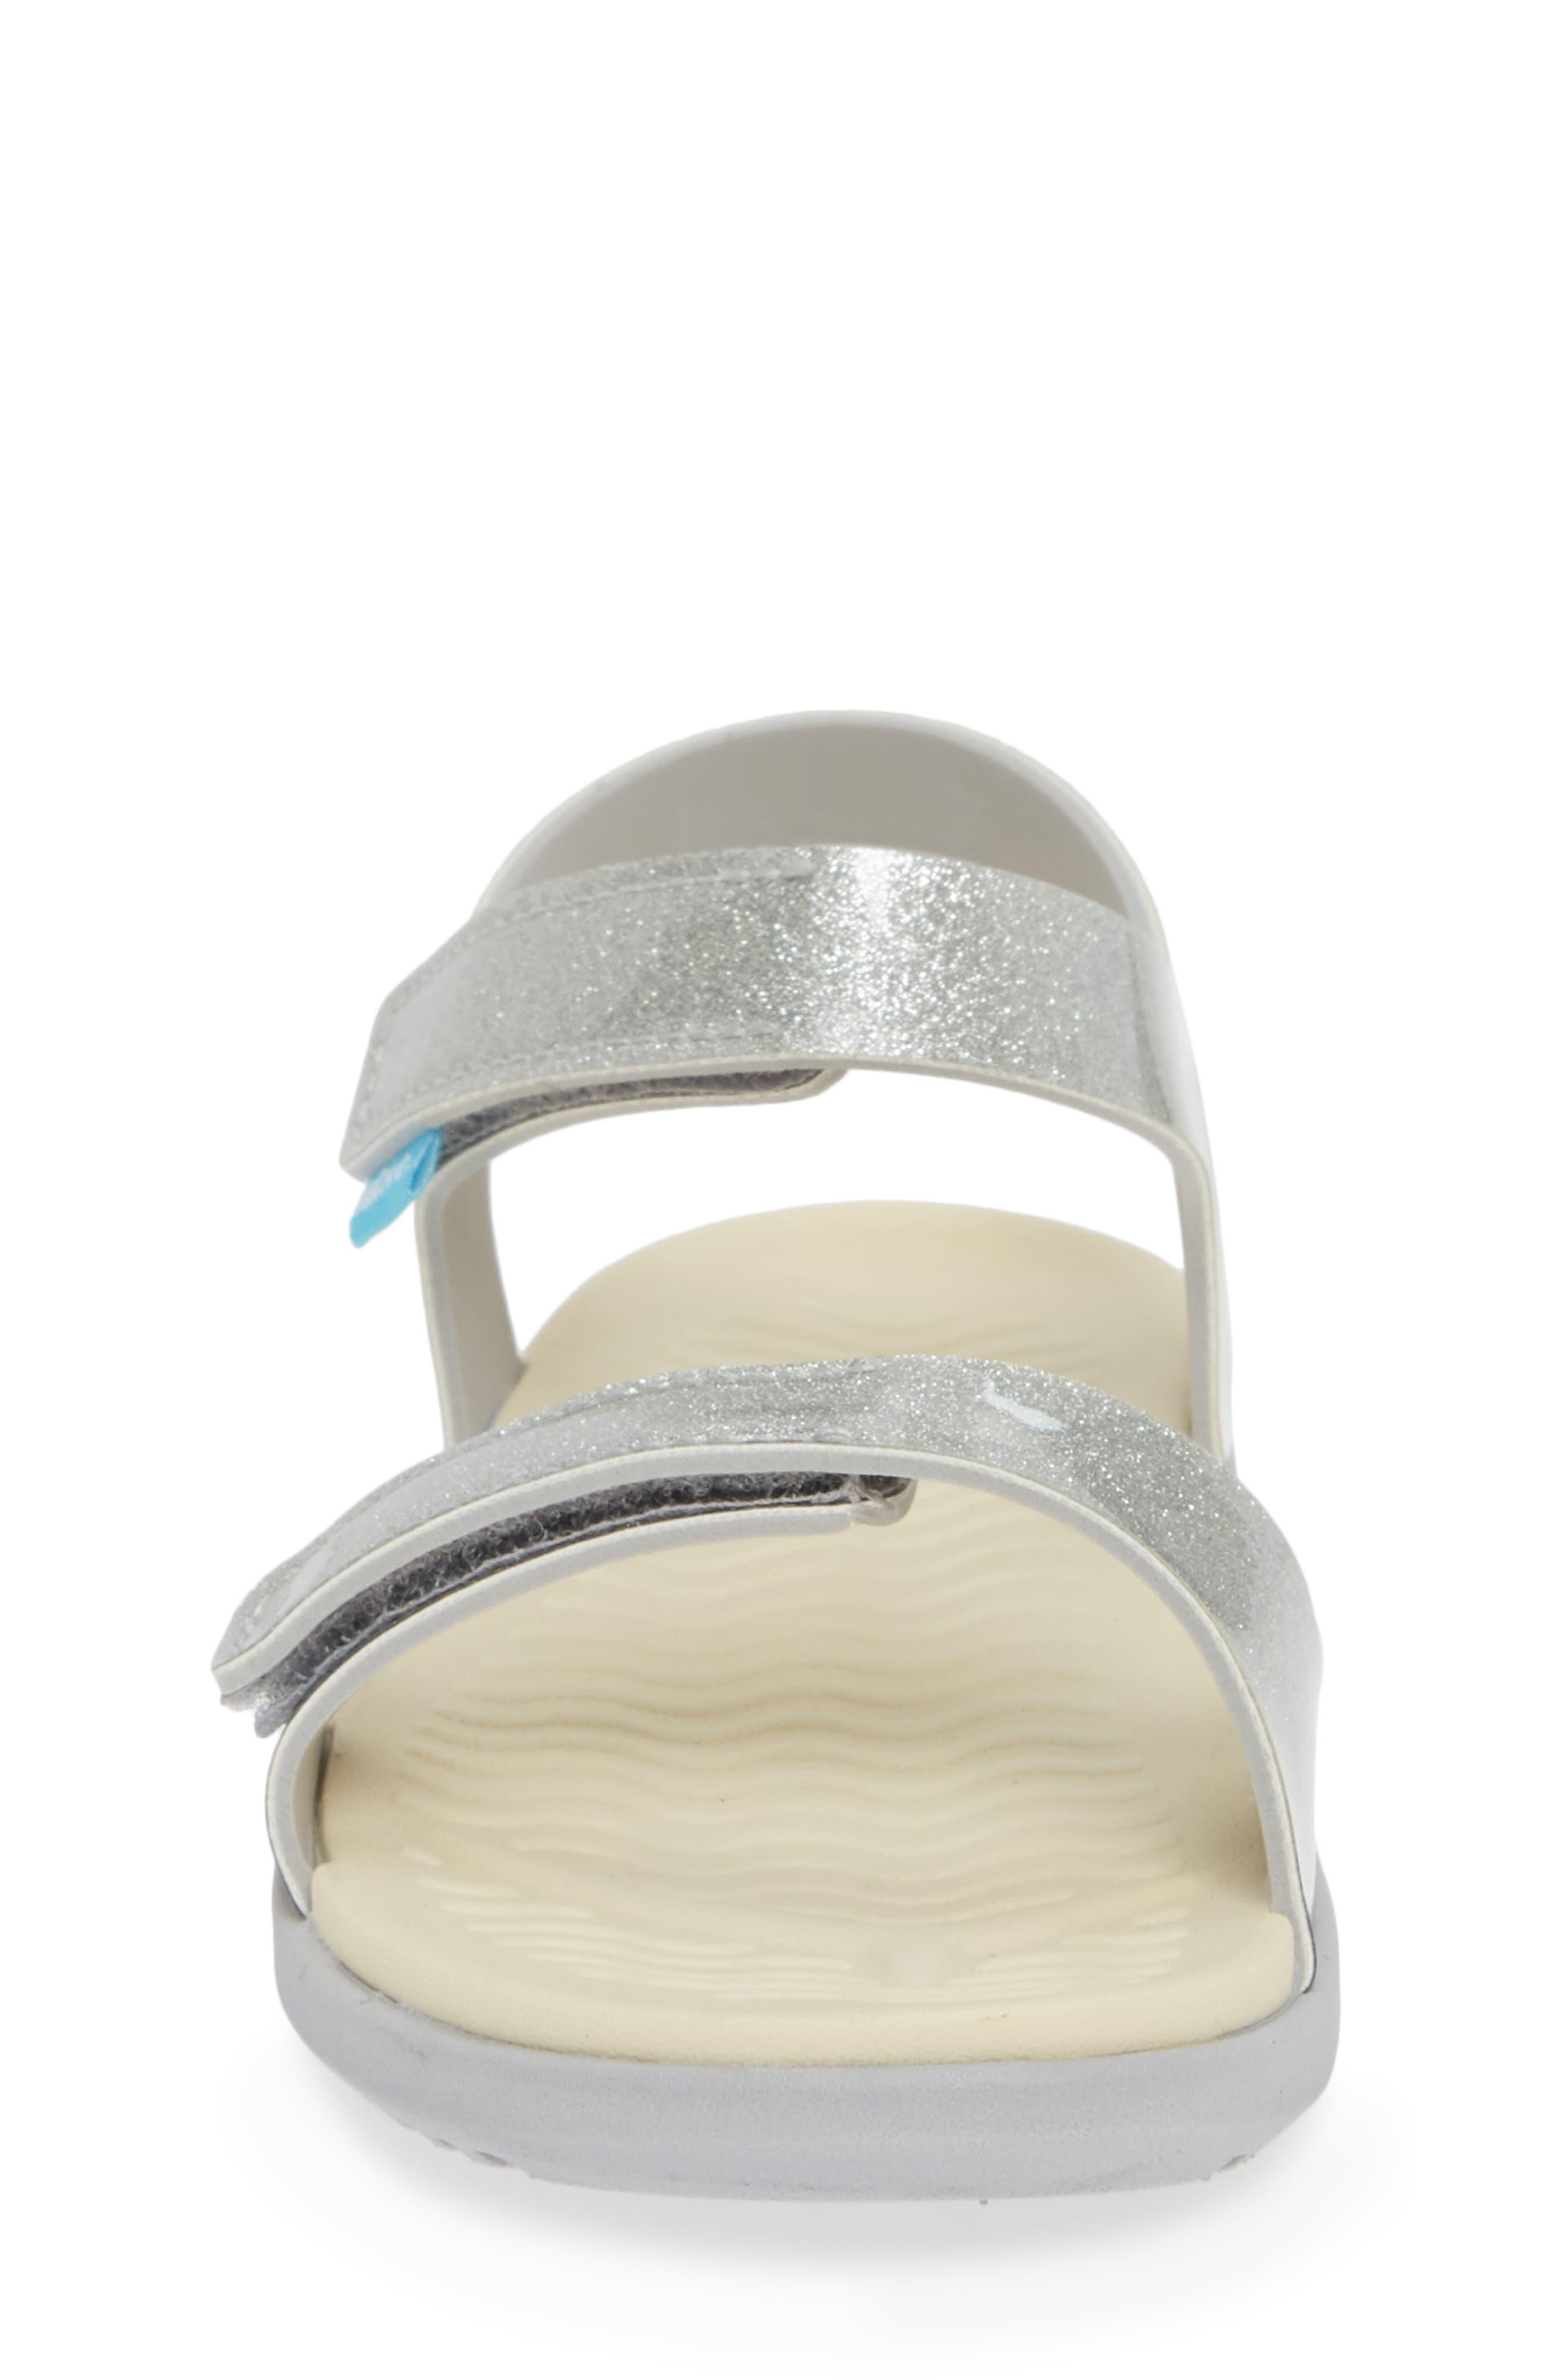 Charley Child Waterproof Flat Vegan Sandal,                             Alternate thumbnail 4, color,                             SILVER GLITTER/ WHITE/ GREY